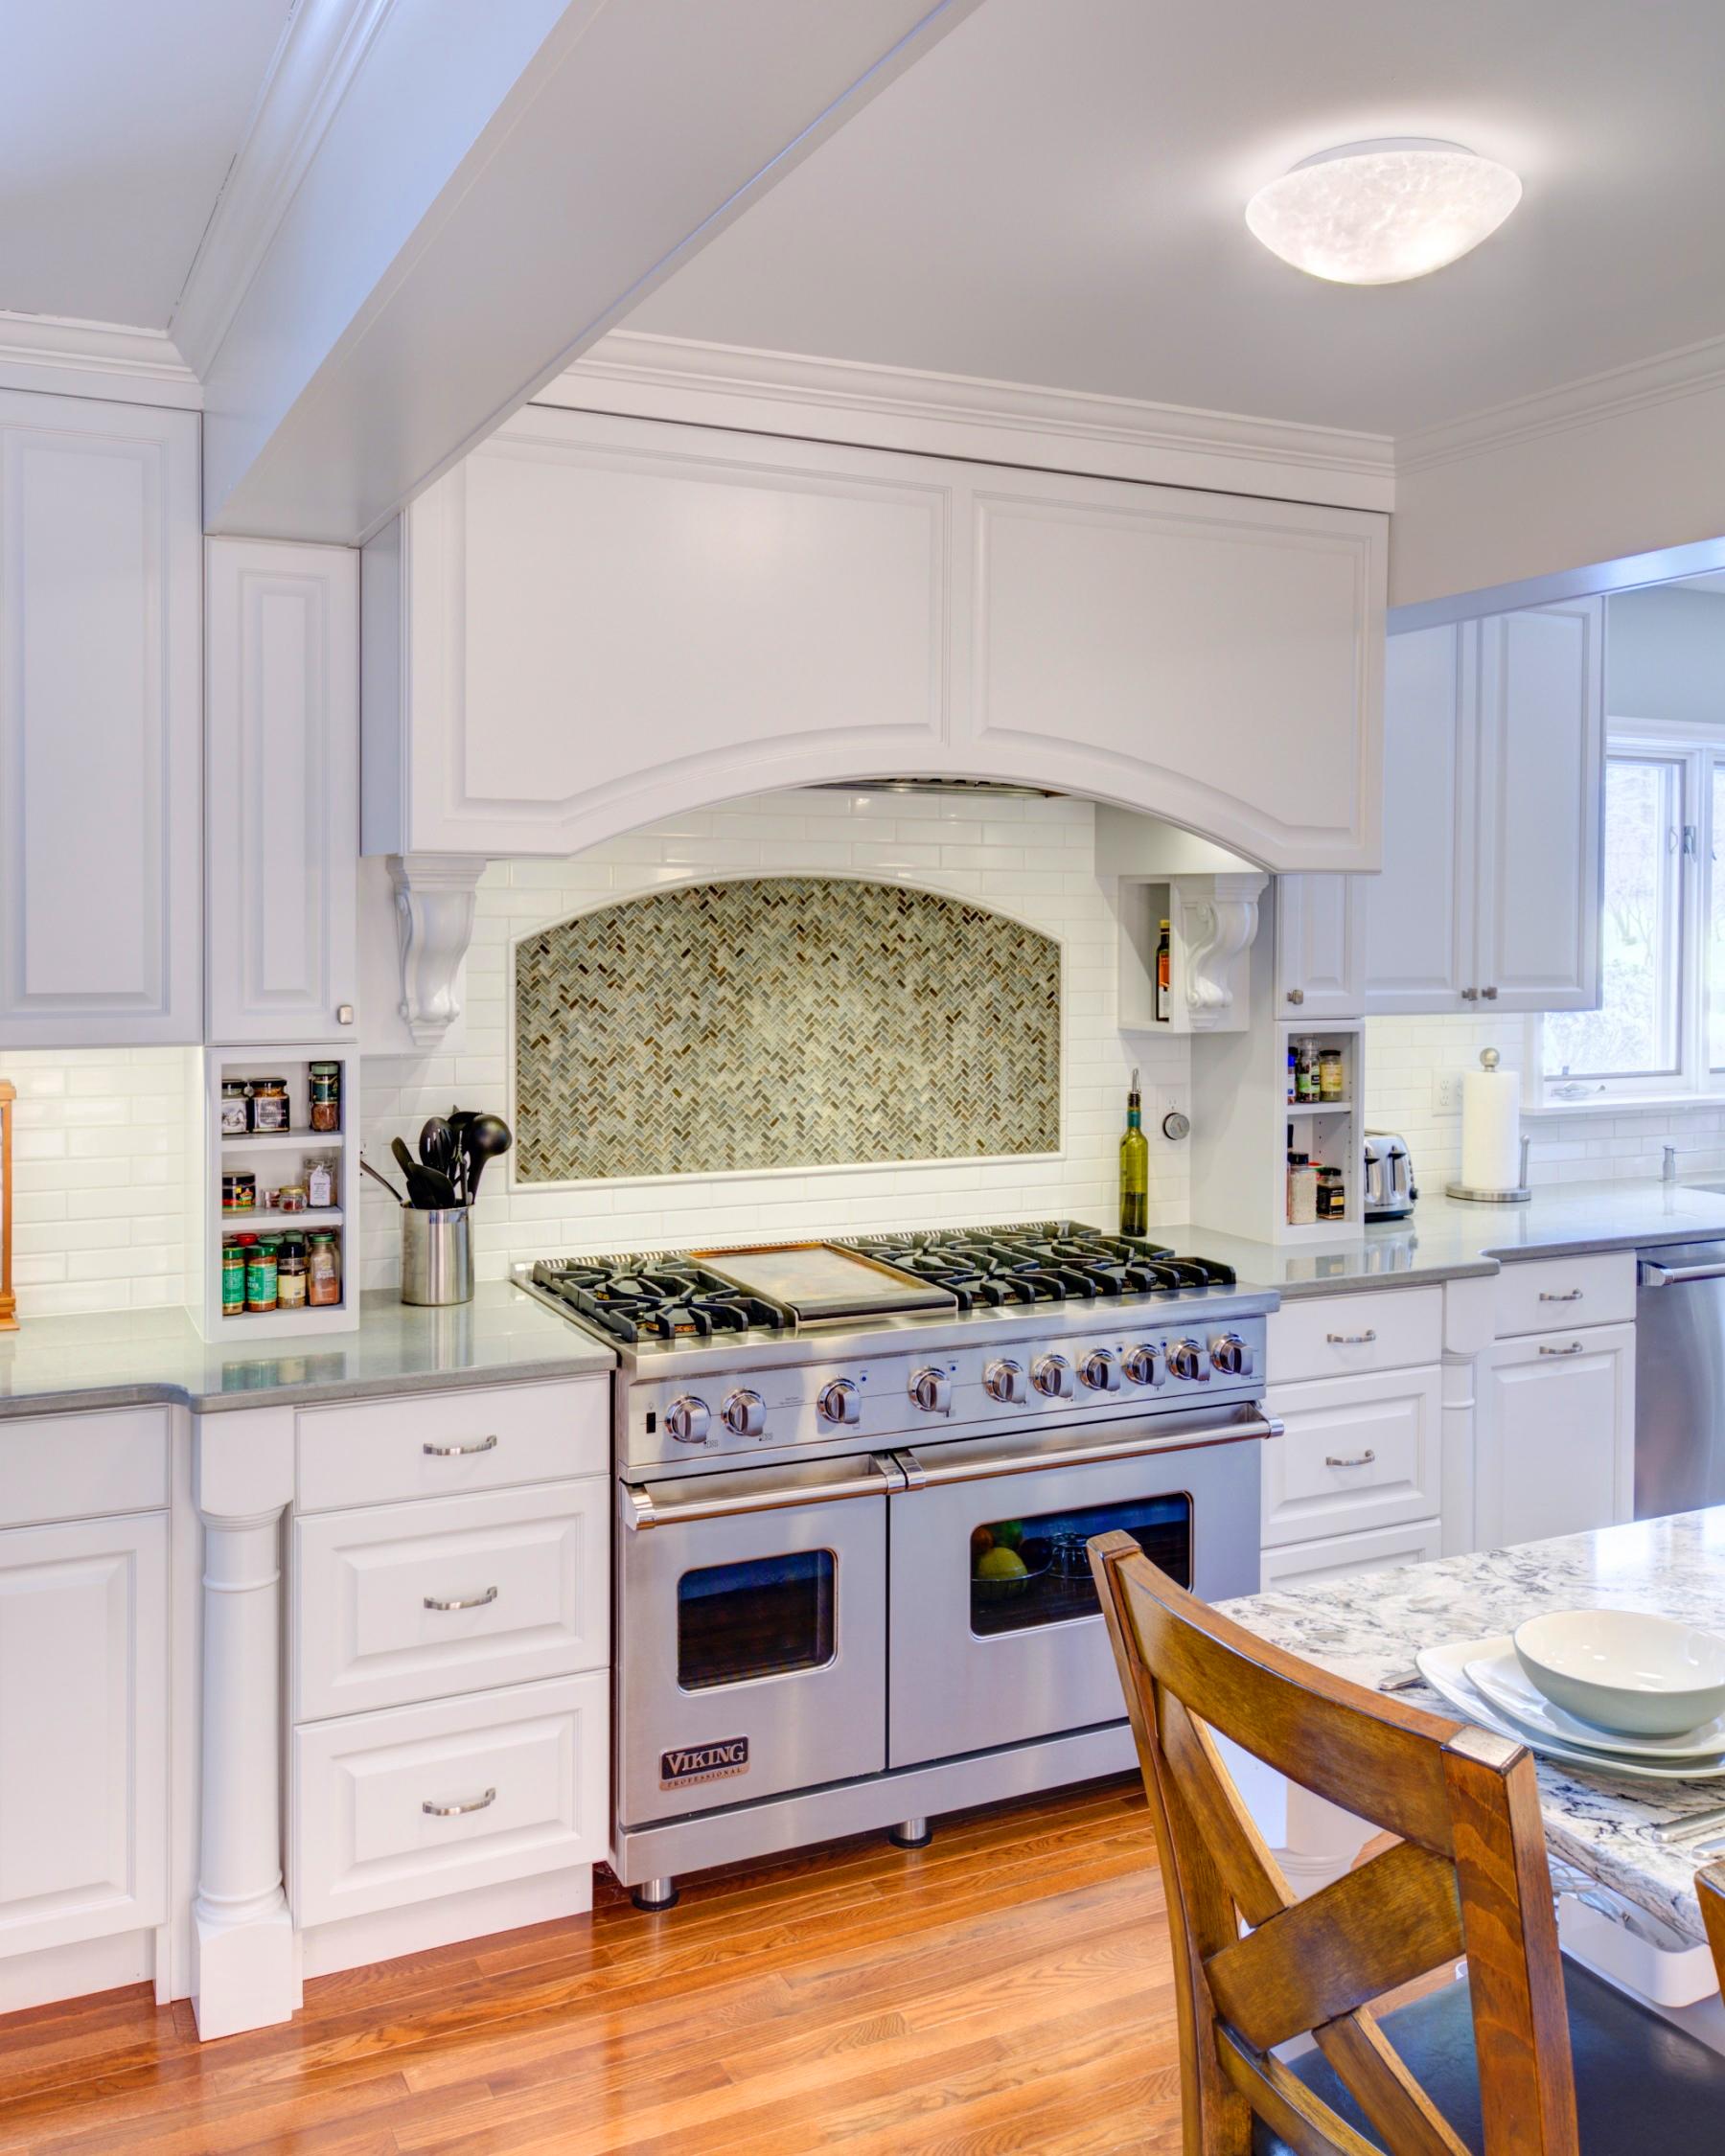 Kitchens_11.jpg